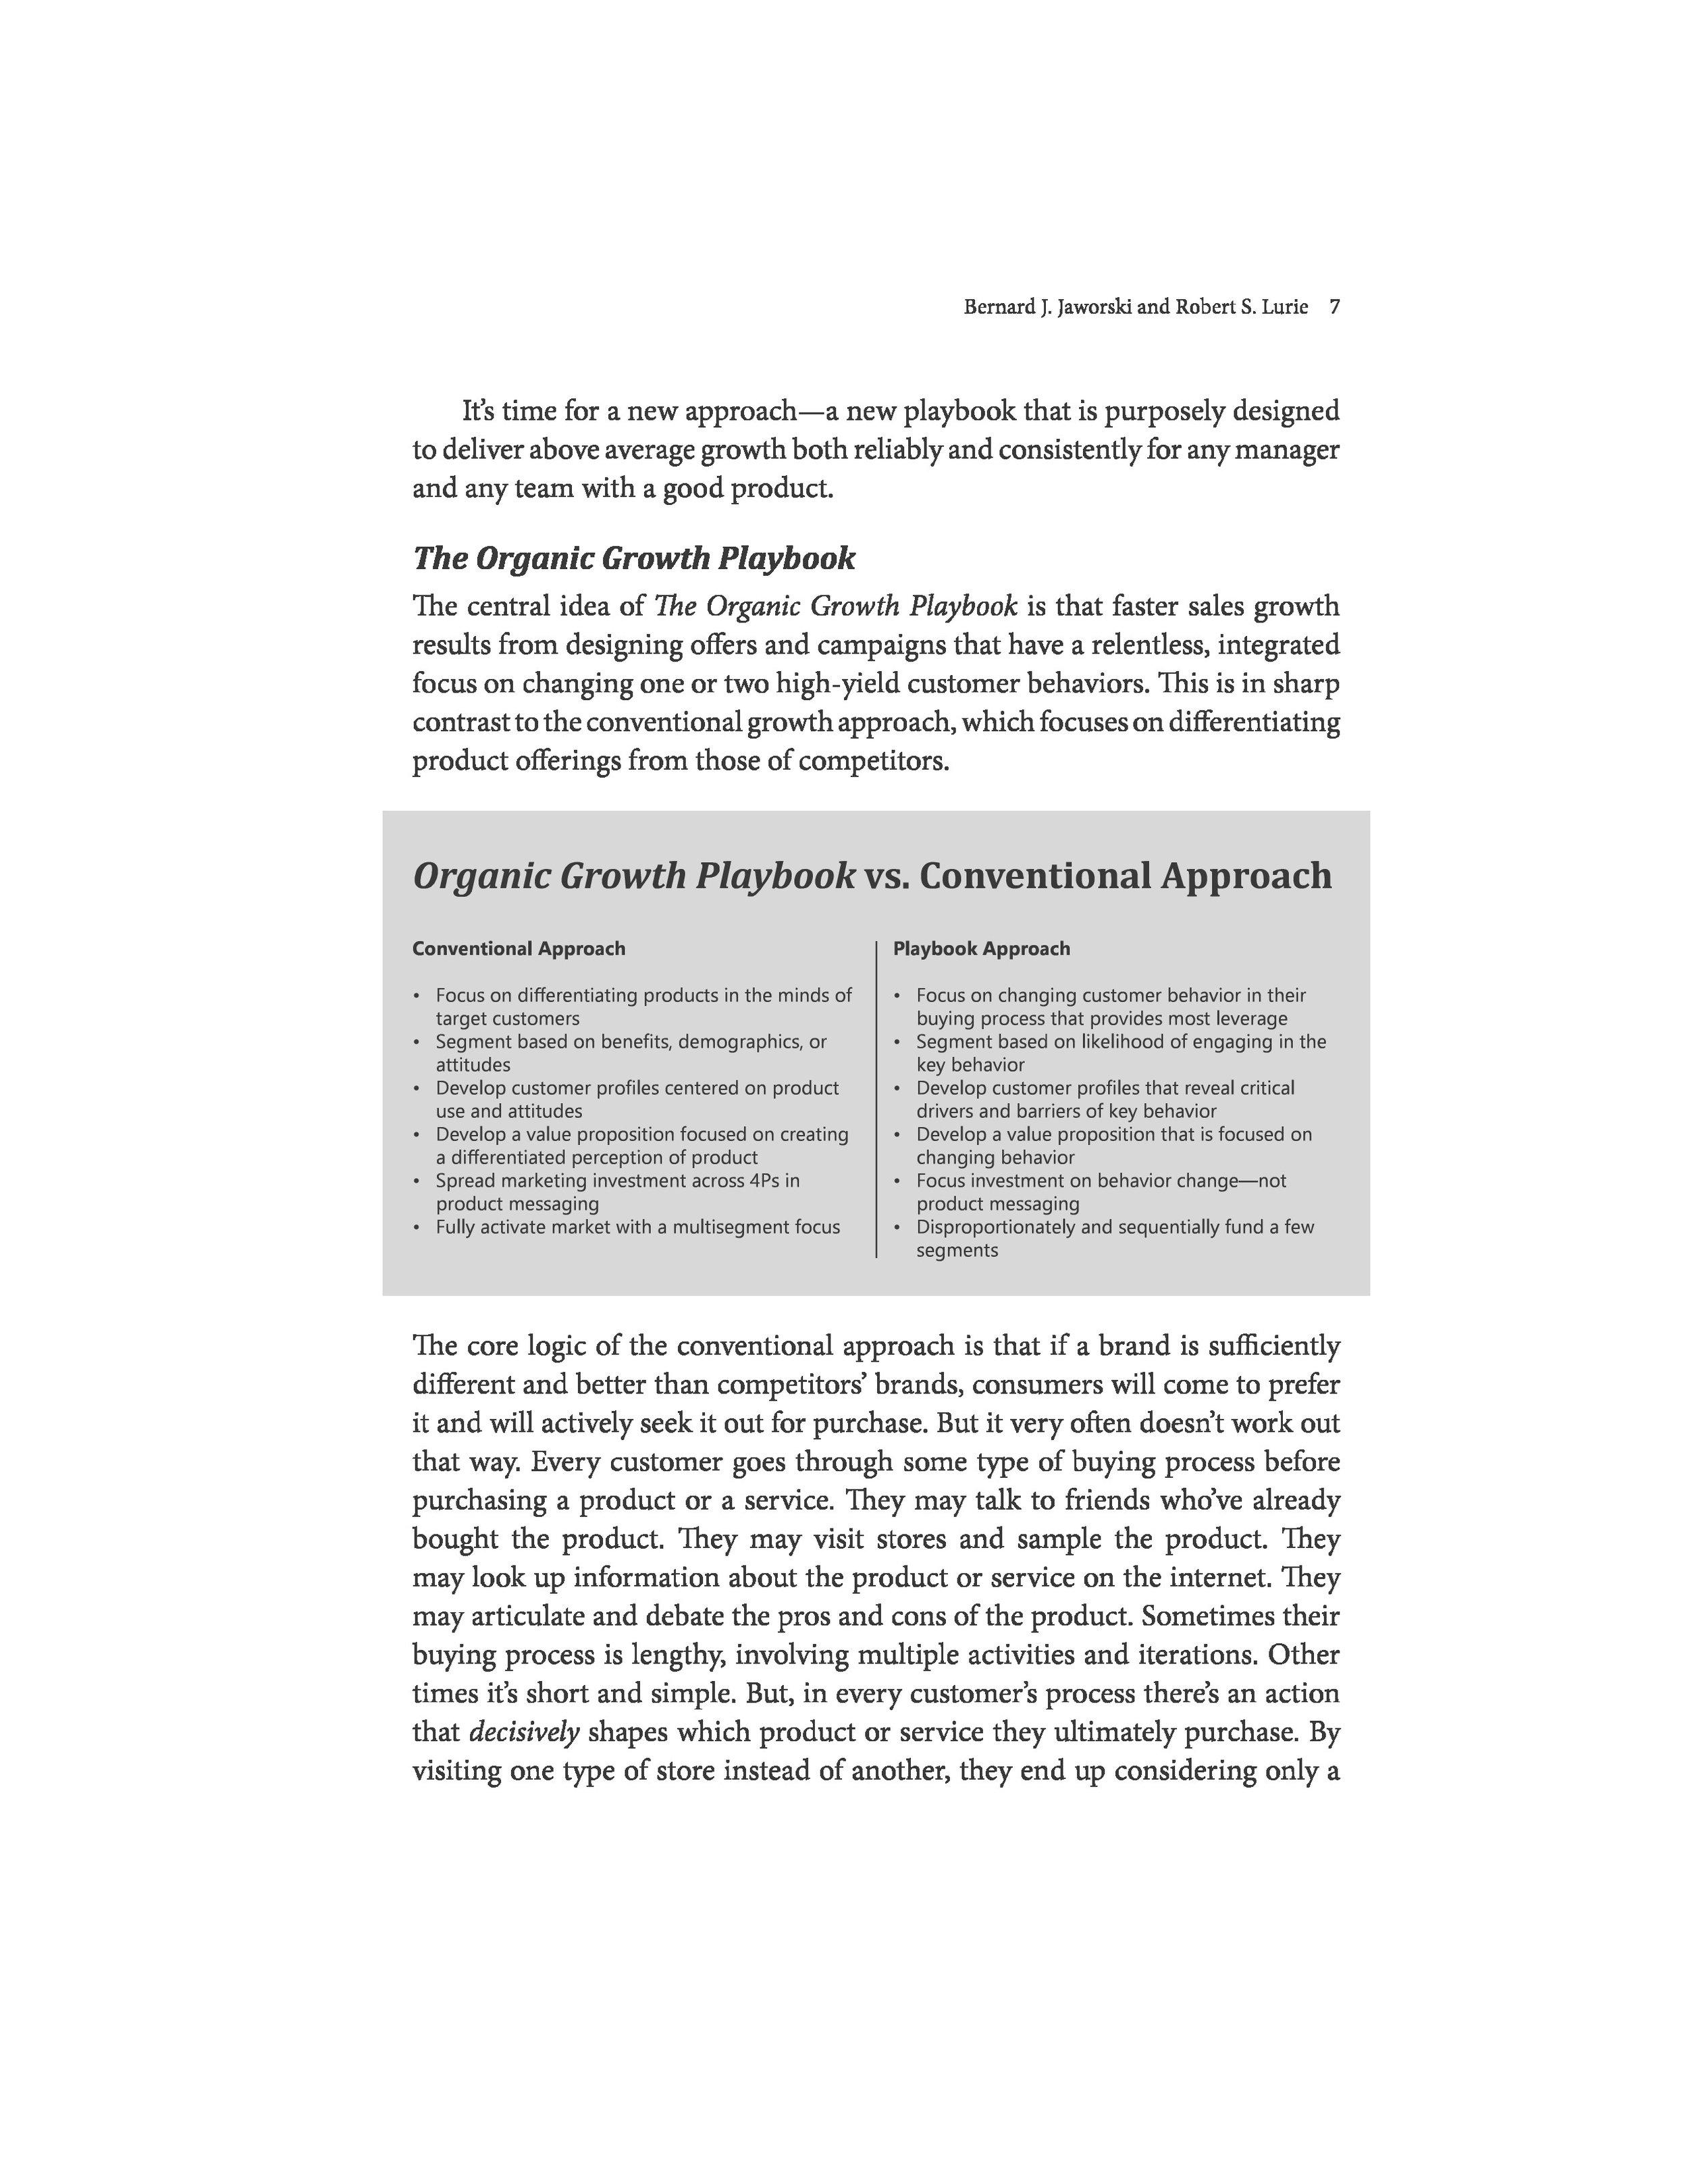 OGP excerpt-page-6.jpg